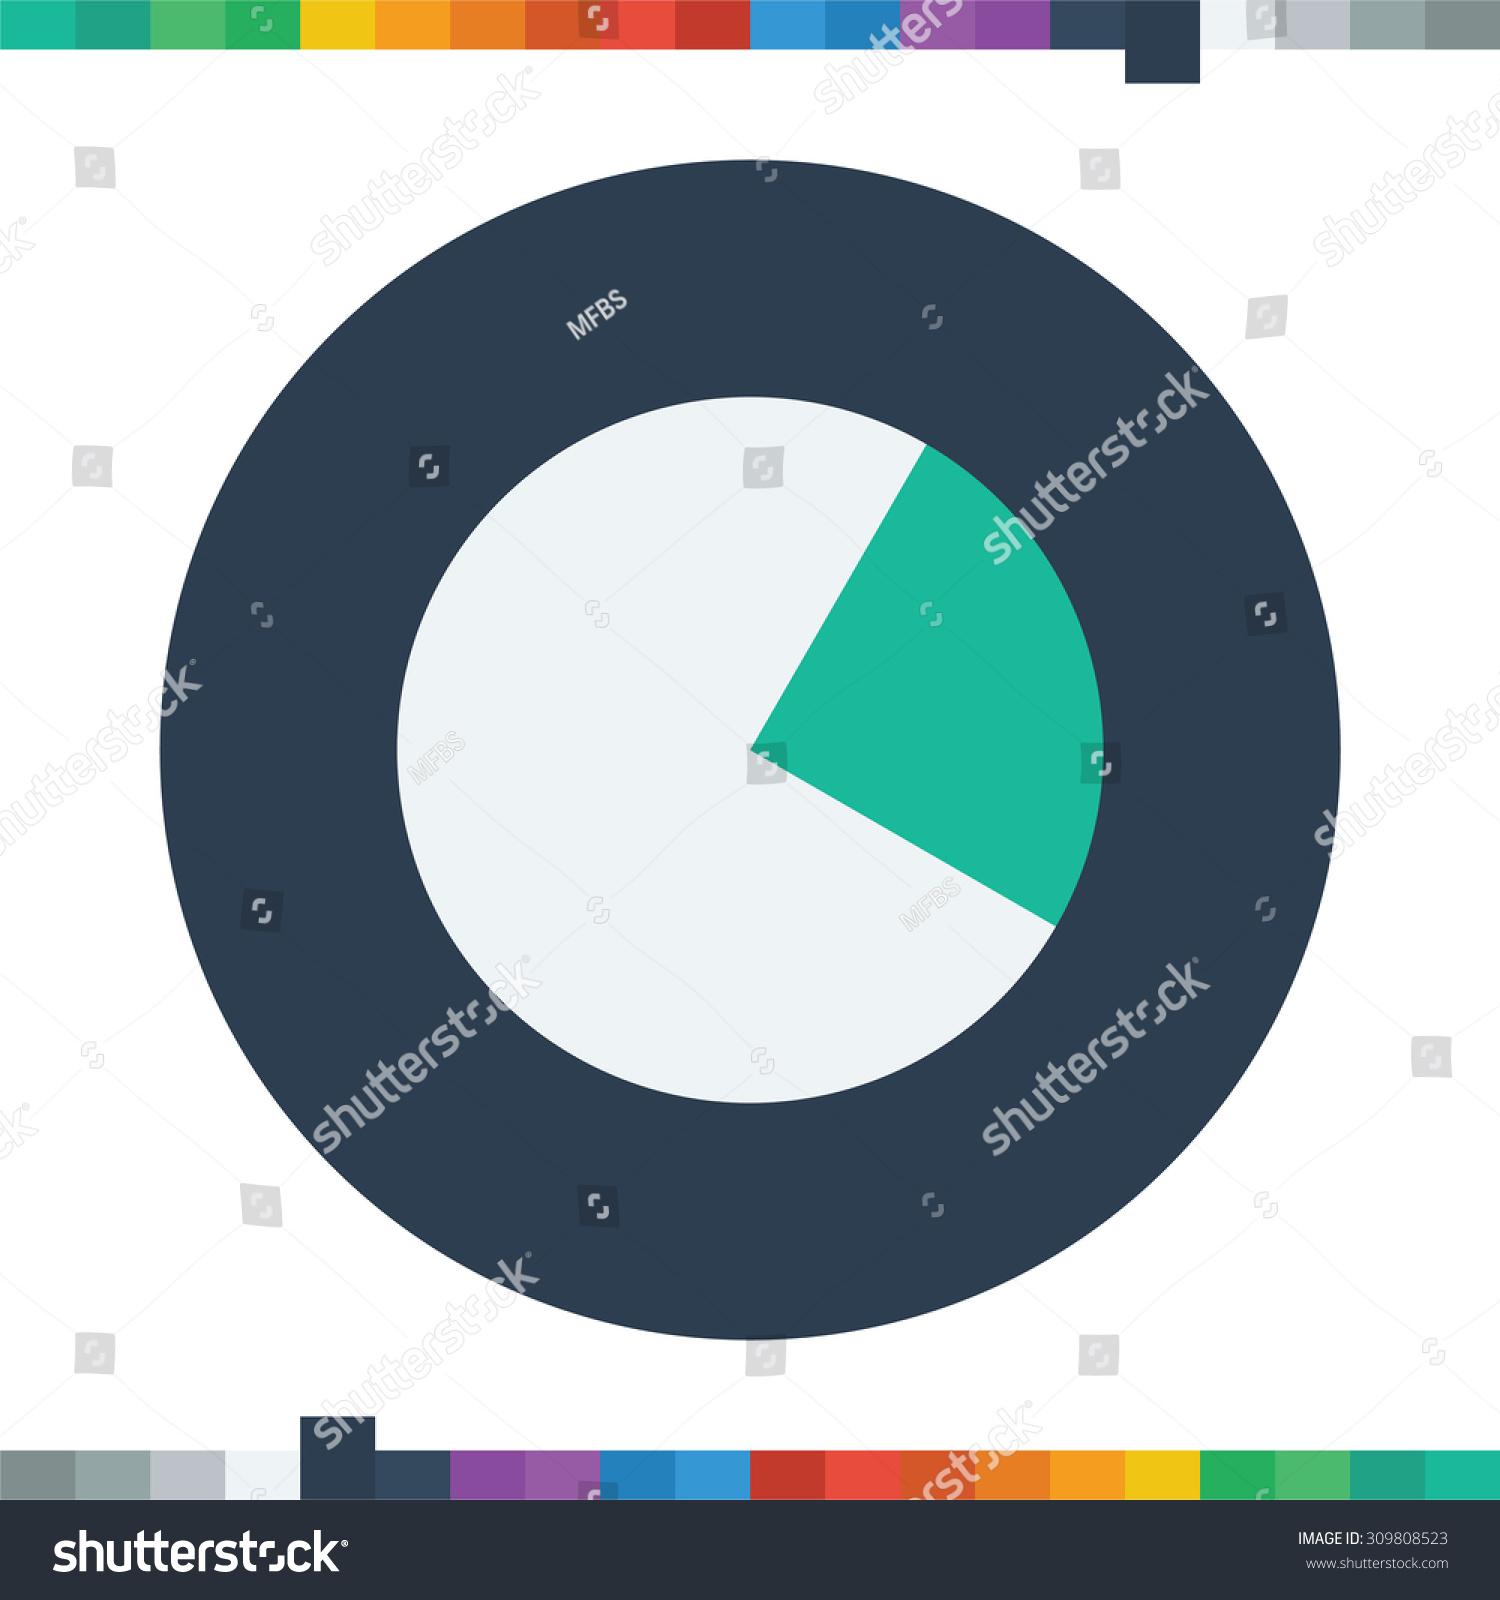 Segment pie chart iconcircle diagram business stock vector segment pie chart iconcircle diagram business icon ccuart Images